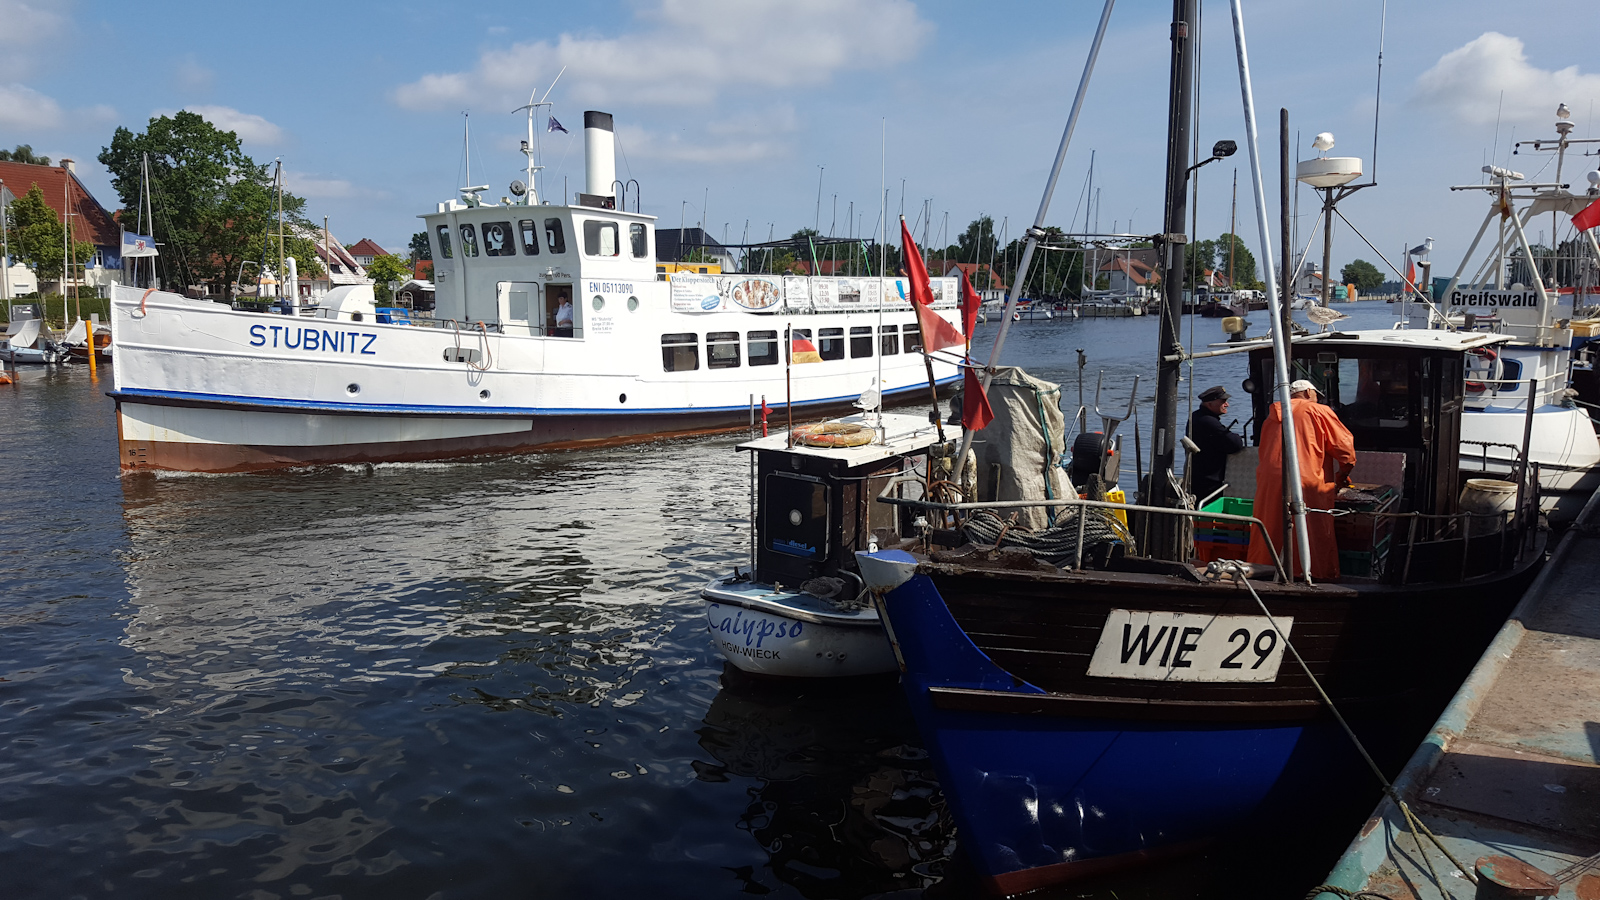 Unterwegs in Greifswald-Wieck